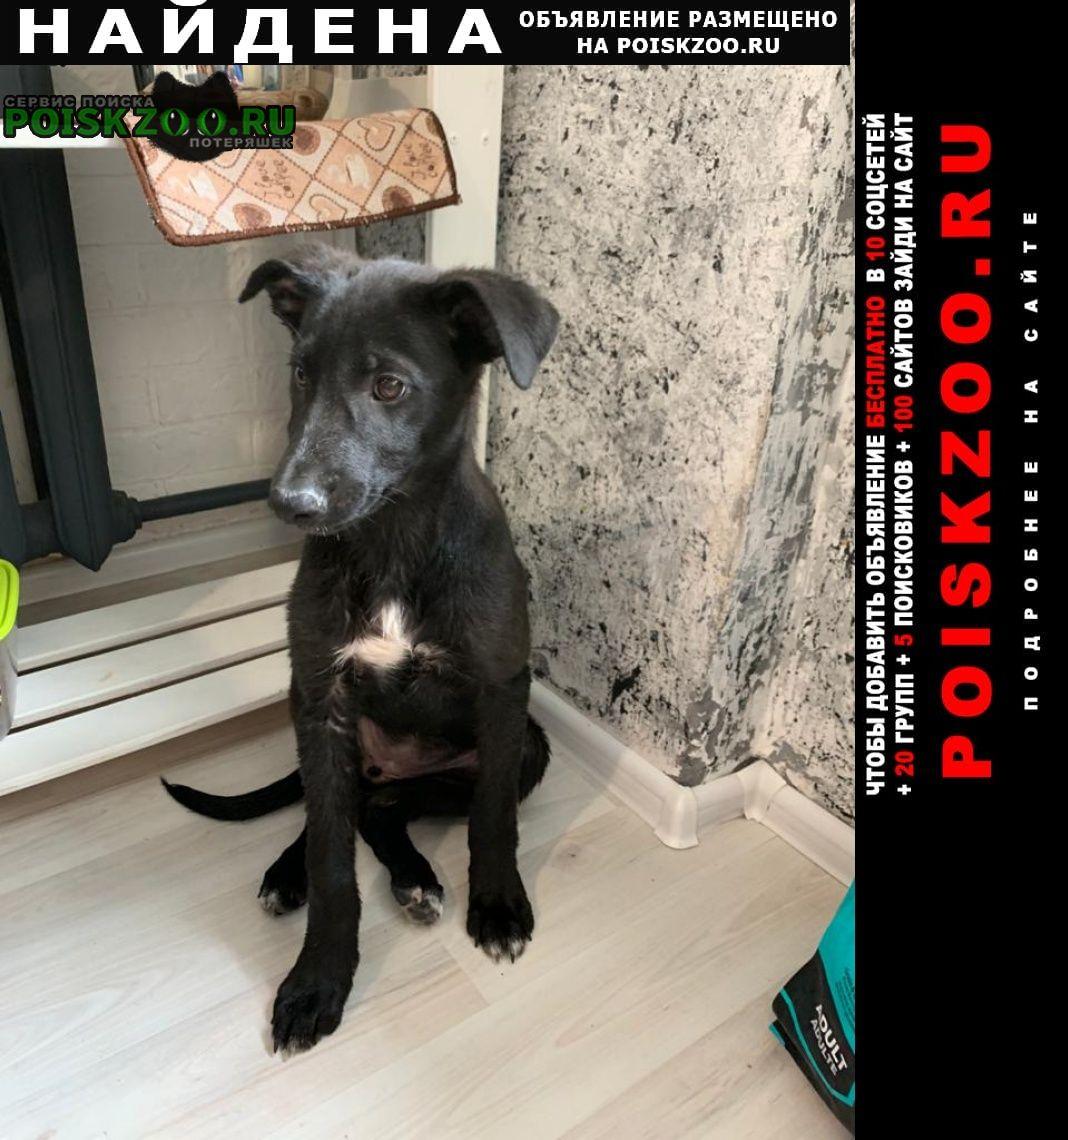 Найдена собака (девочка) Екатеринбург